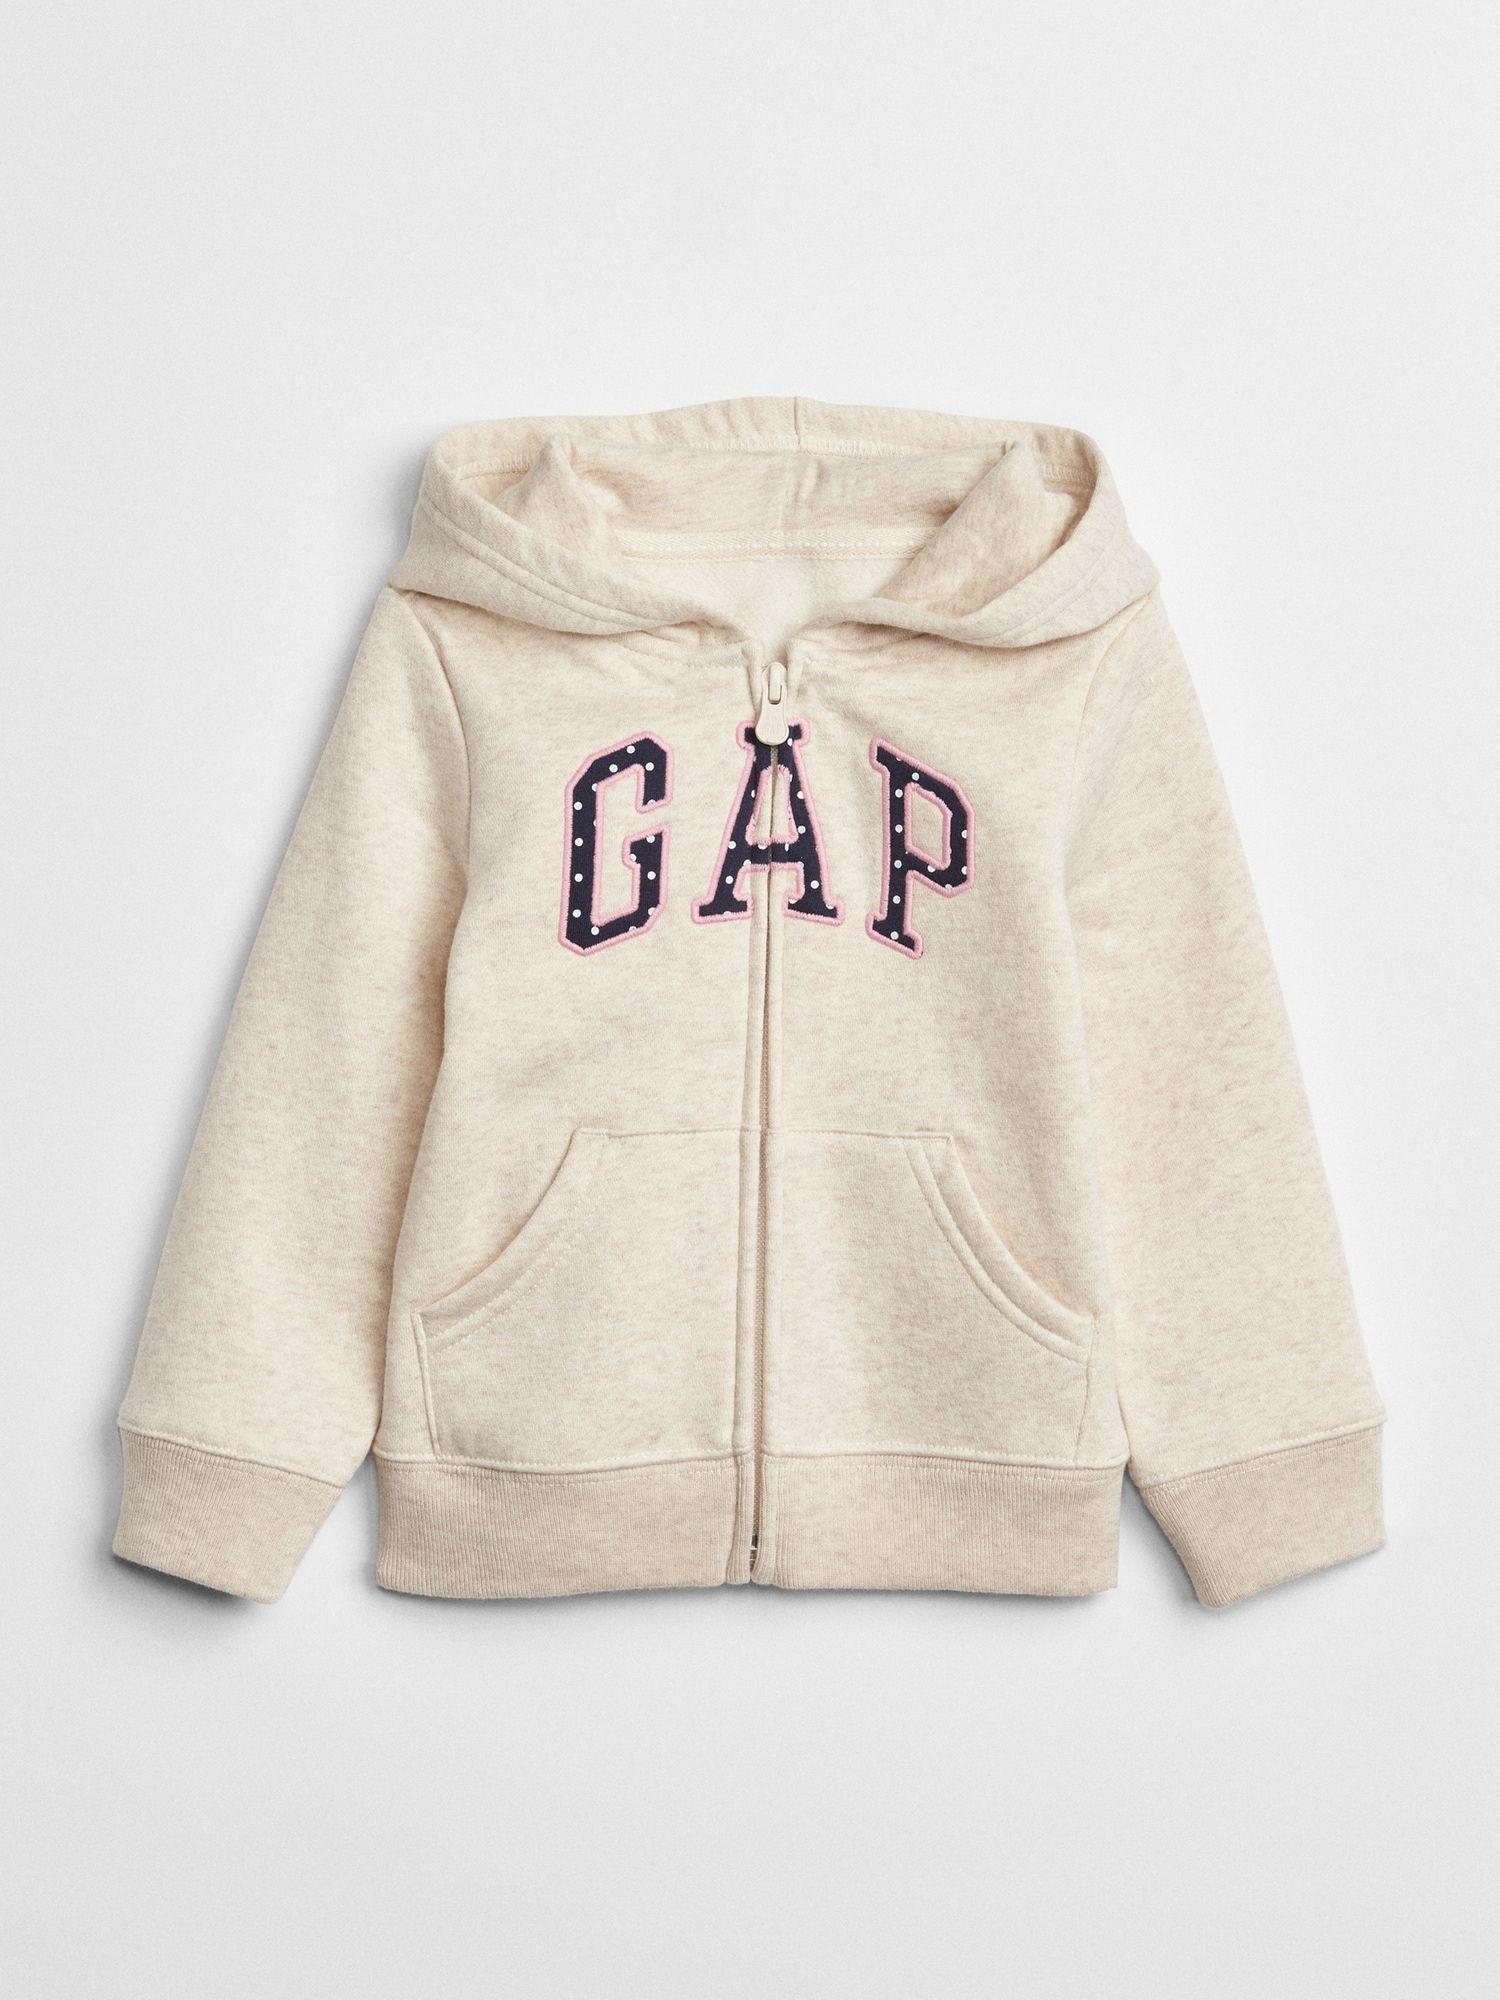 Toddler Gap Logo Hoodie Sweatshirt Sweatshirts Hoodie Sweatshirts Hoodies